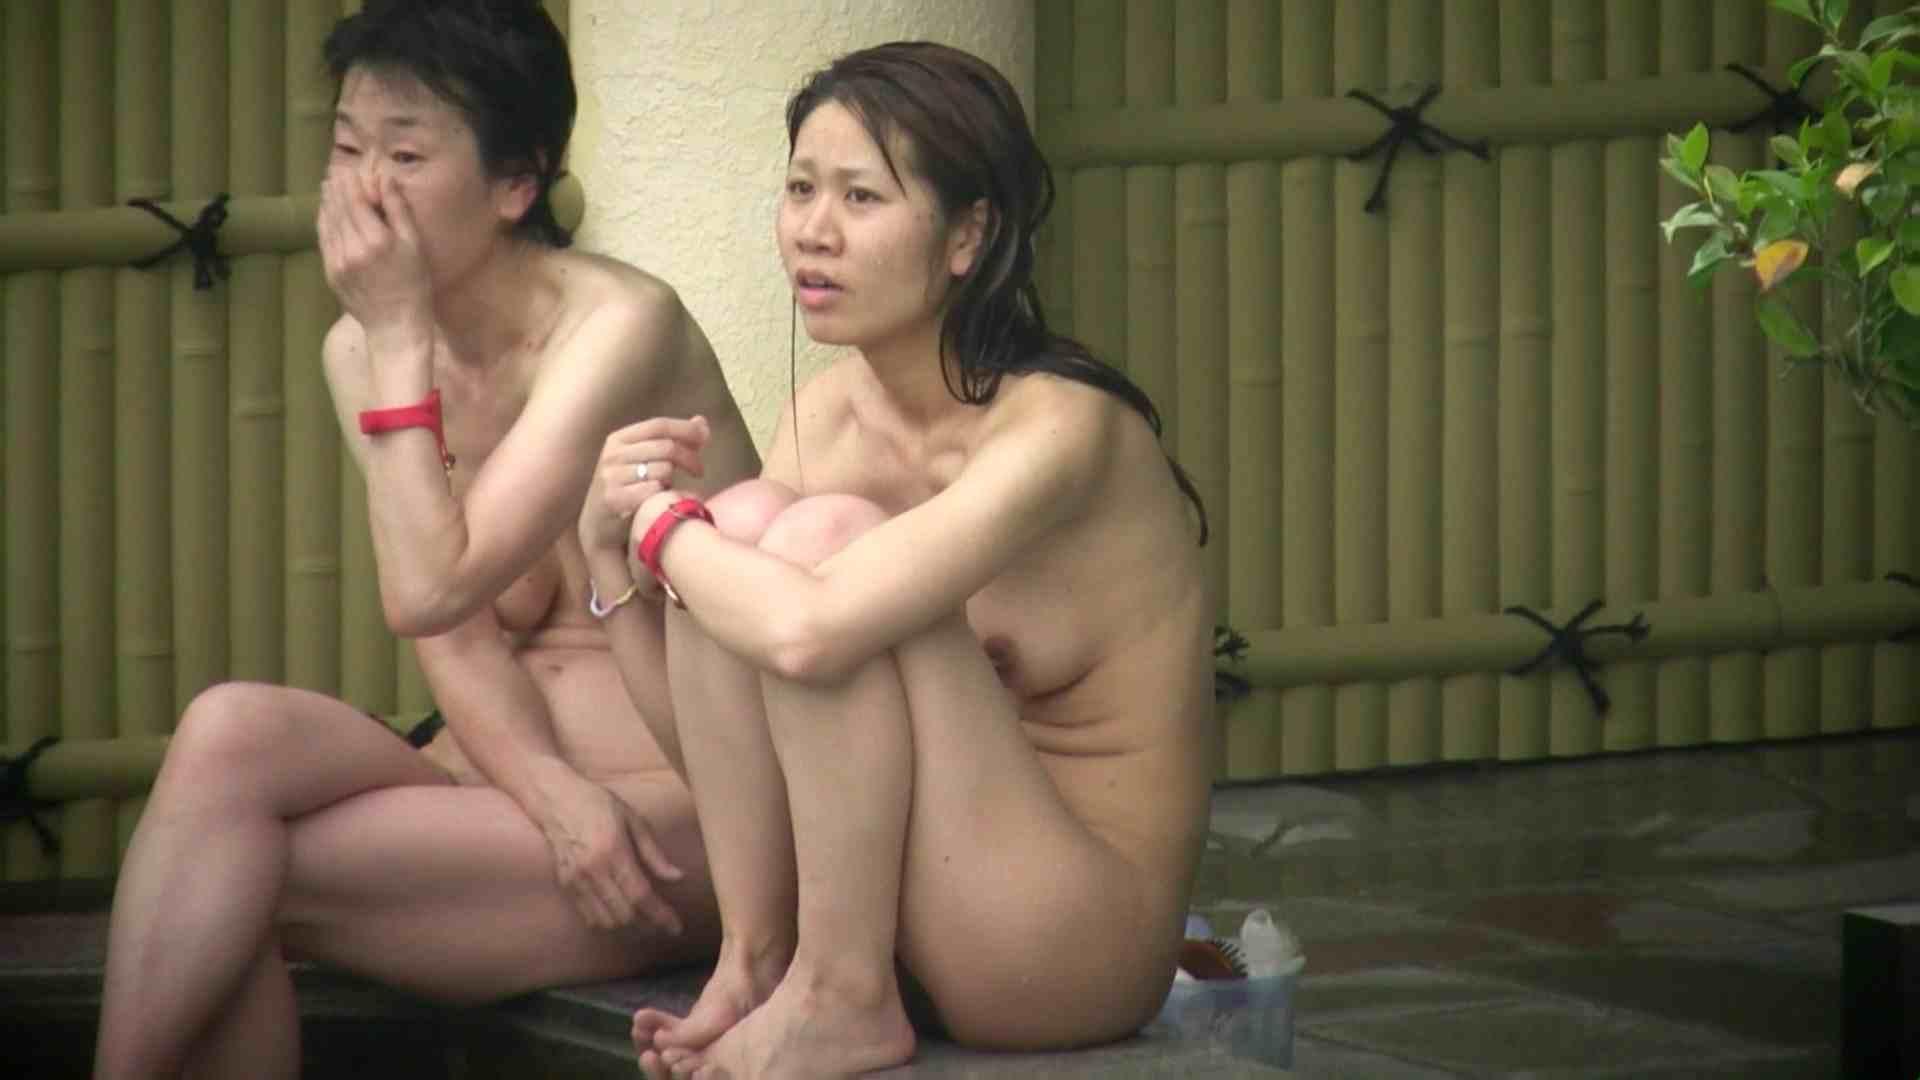 Aquaな露天風呂Vol.07 盗撮シリーズ   露天風呂編  94PIX 7